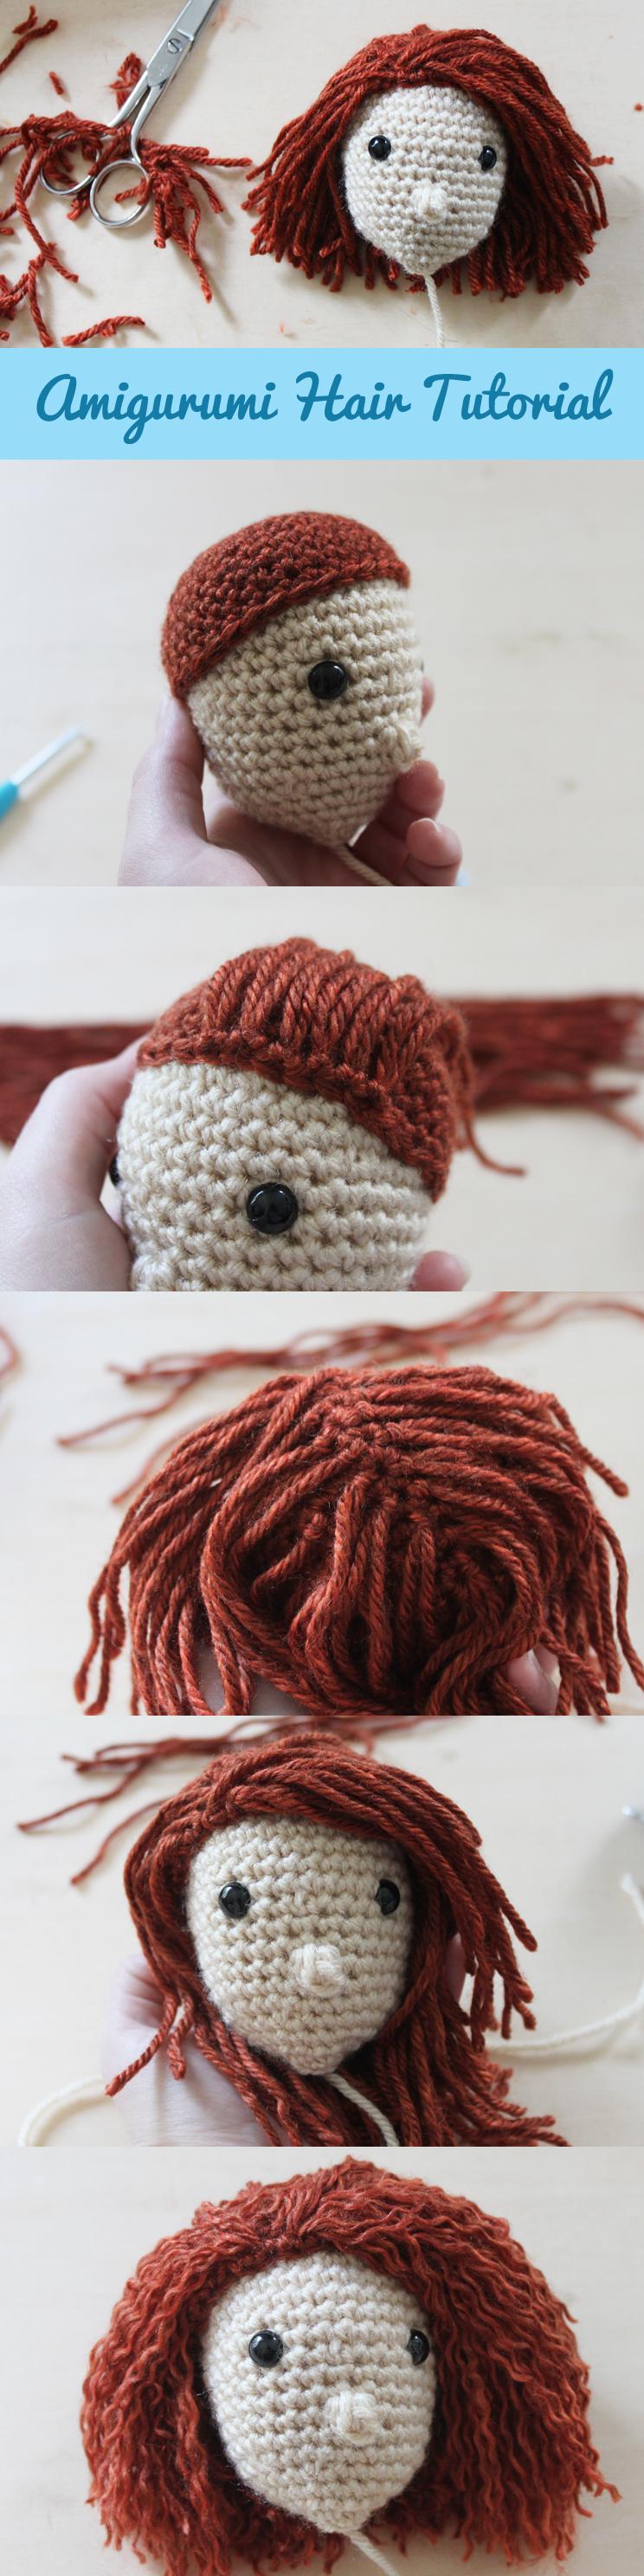 How to... Make Curly Hair | Crochet amigurumi, Crochet patterns ... | 2976x744